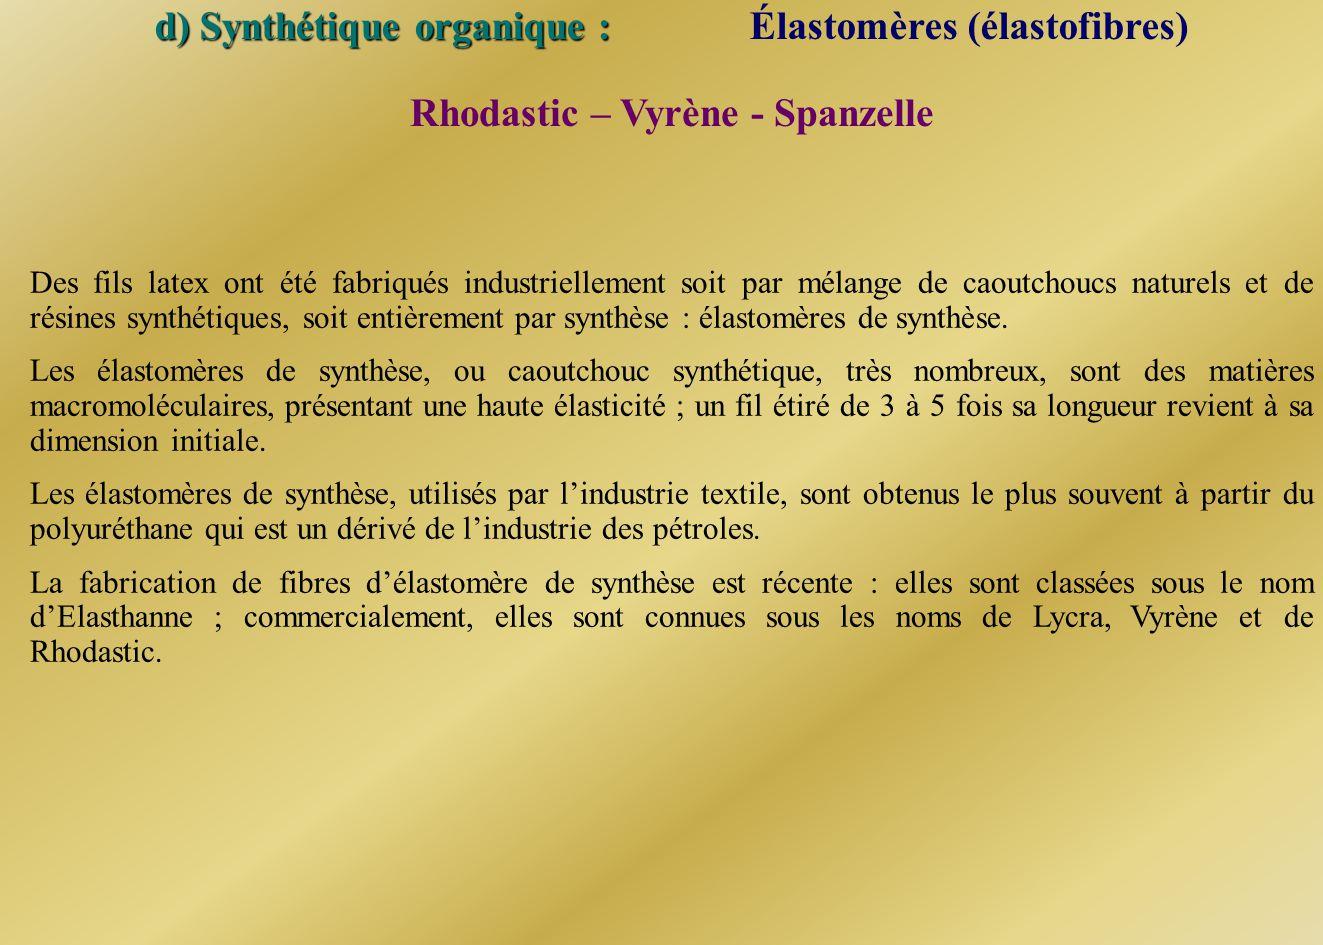 Rhodastic – Vyrène - Spanzelle